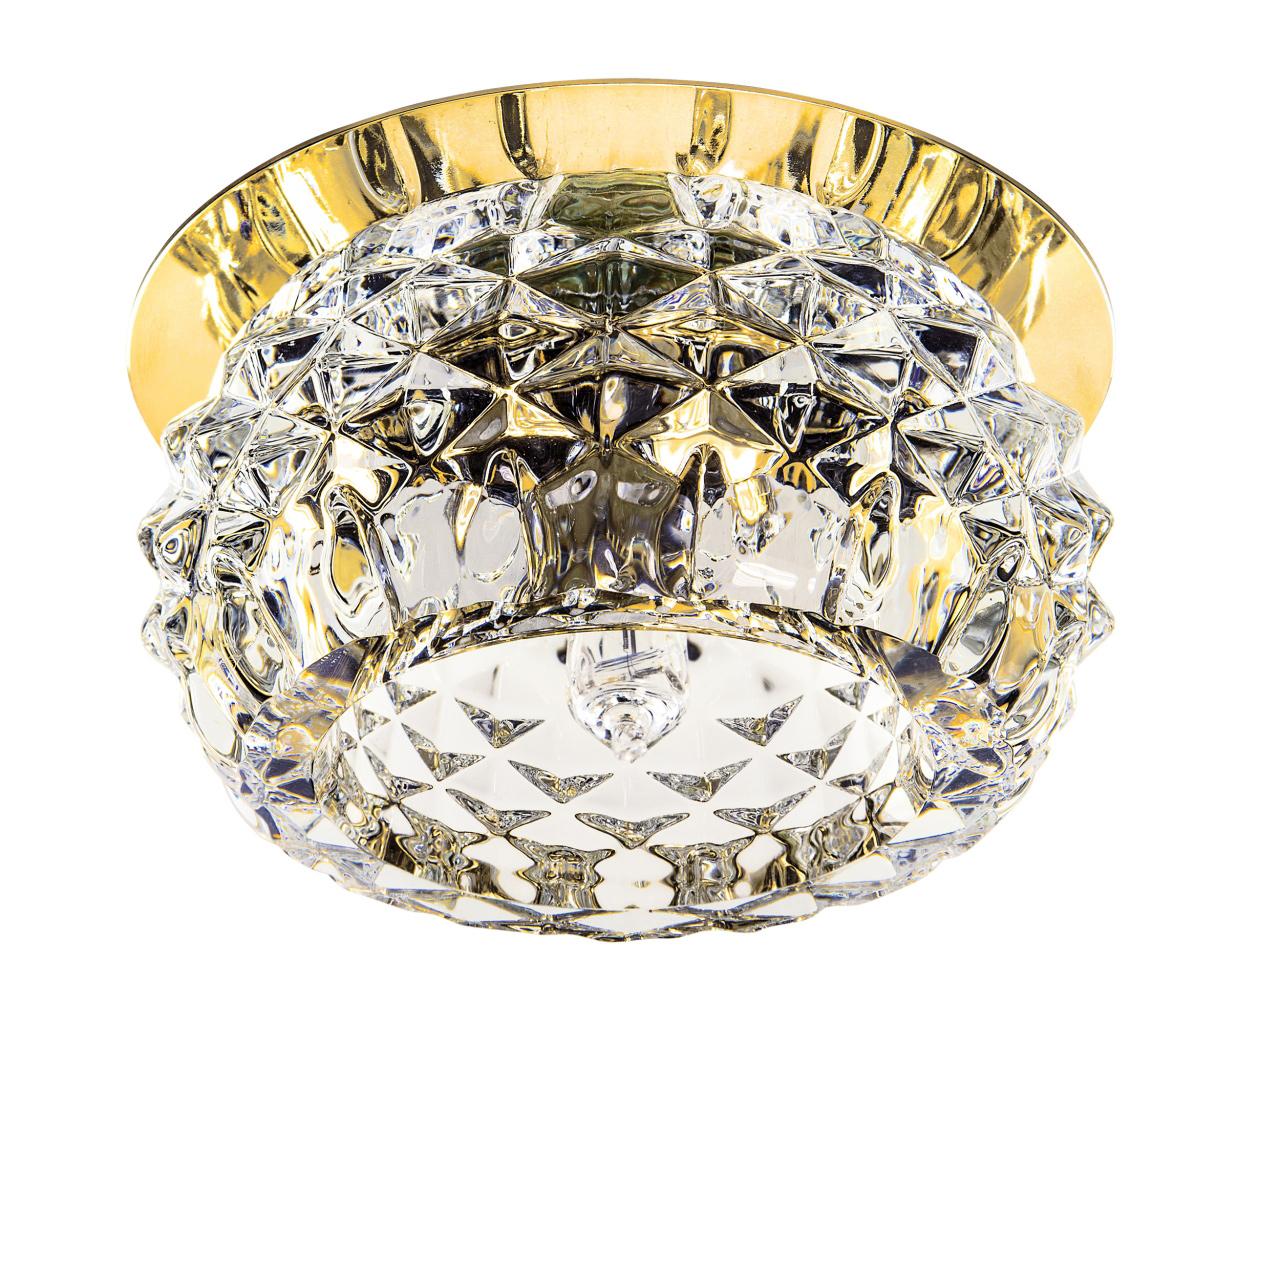 Светильник Cesare Sphe CR золото / прозрачный Lightstar 004252